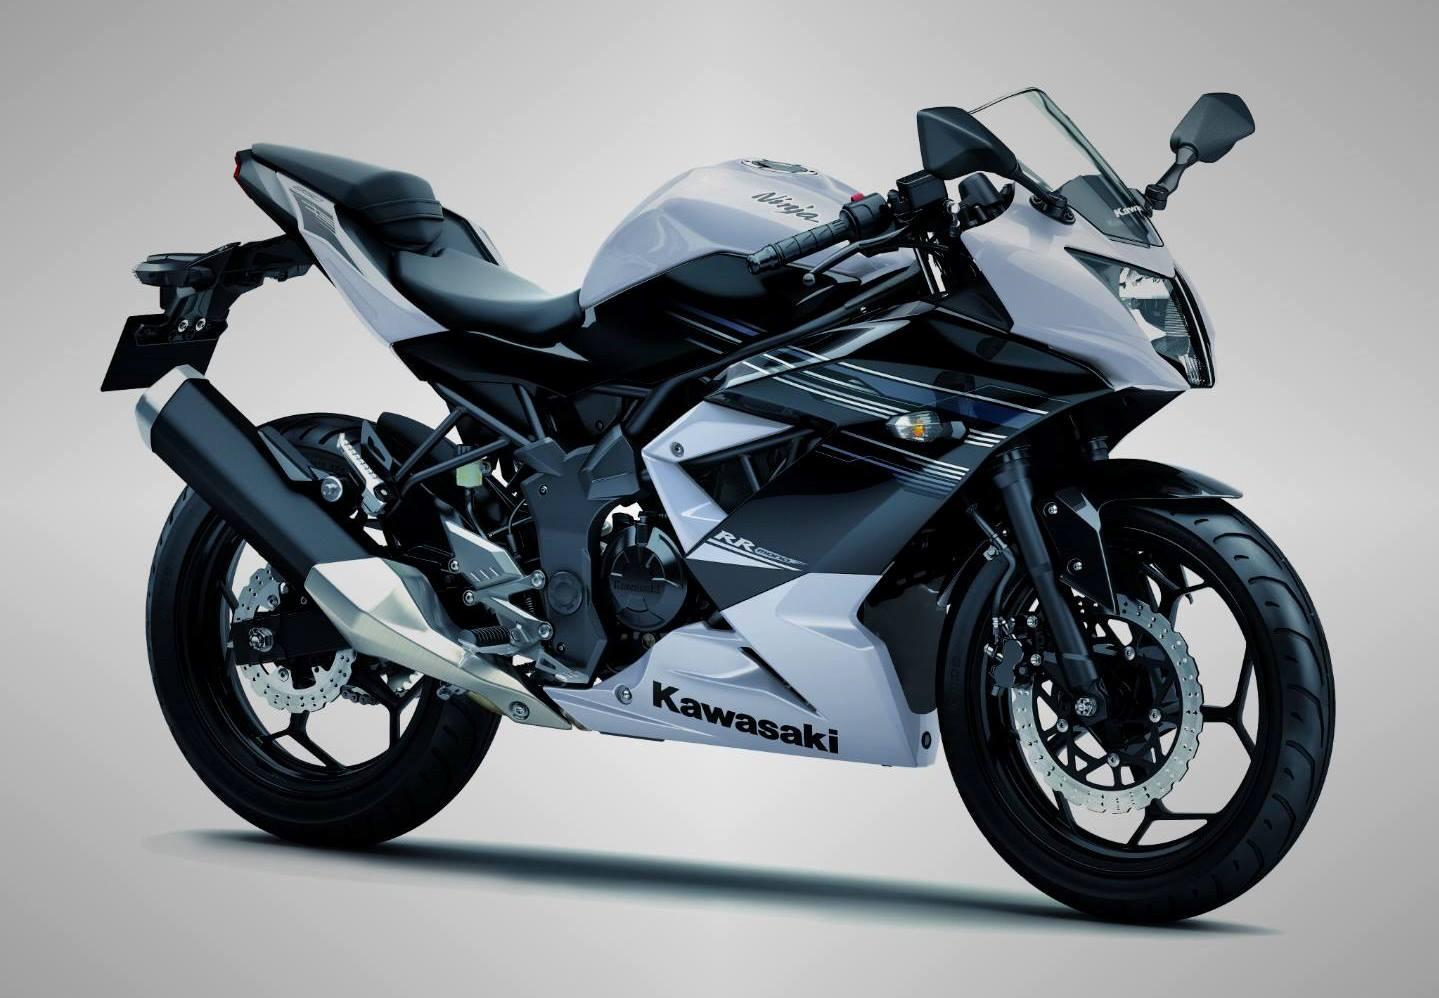 Indonesia - Kawasaki unveils single-cylinder Ninja 250 RR Mono ...